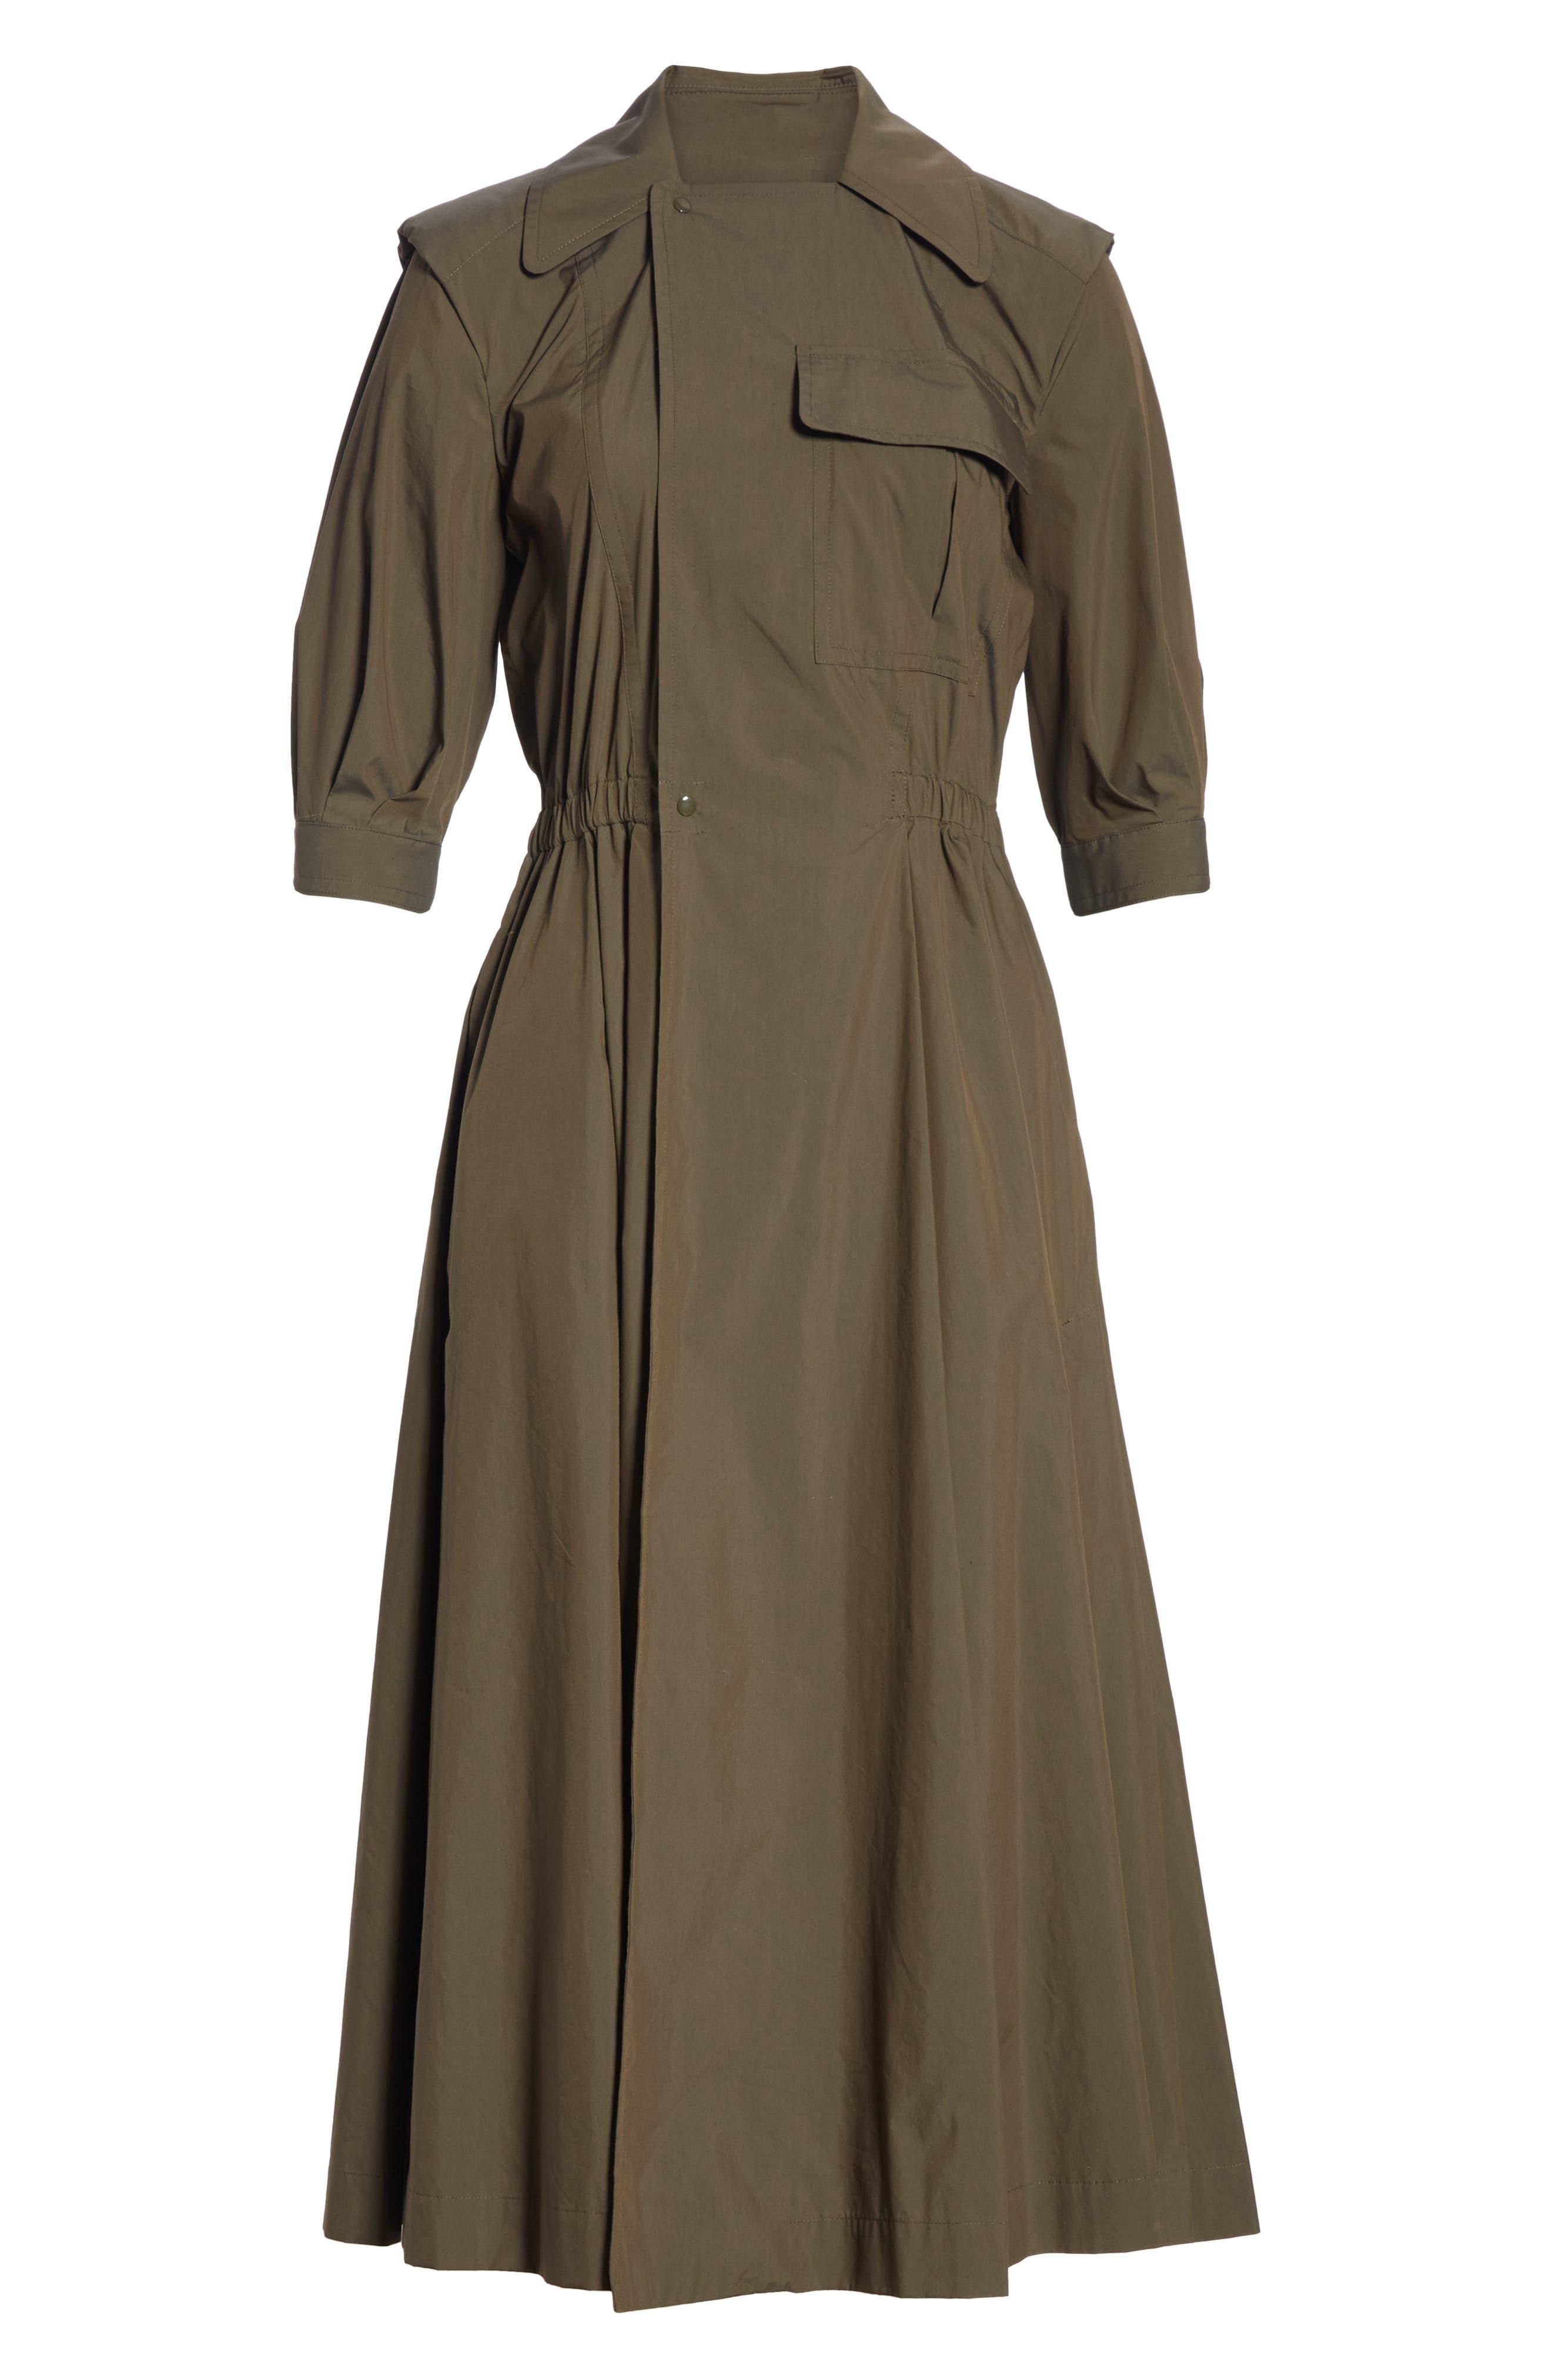 TOGA,                             Trench Taffeta Shirtdress,                             Alternate thumbnail 6, color,                             BROWN